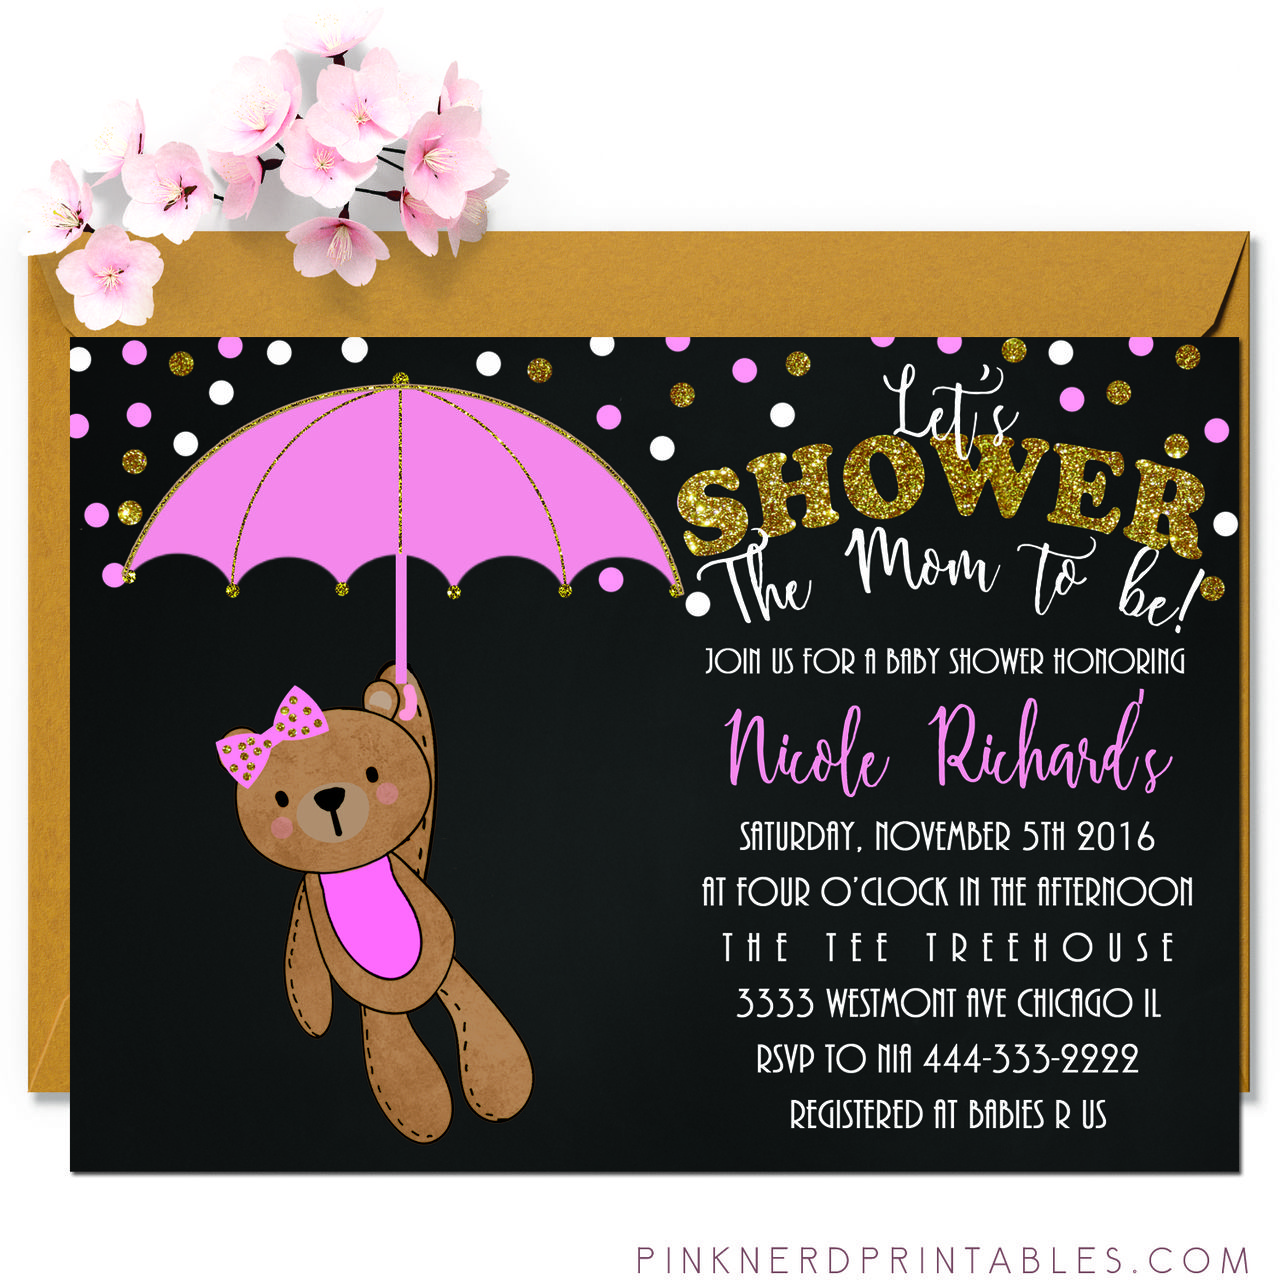 Glitter teddy bear baby shower invitation pink bow - Pink Nerd ...